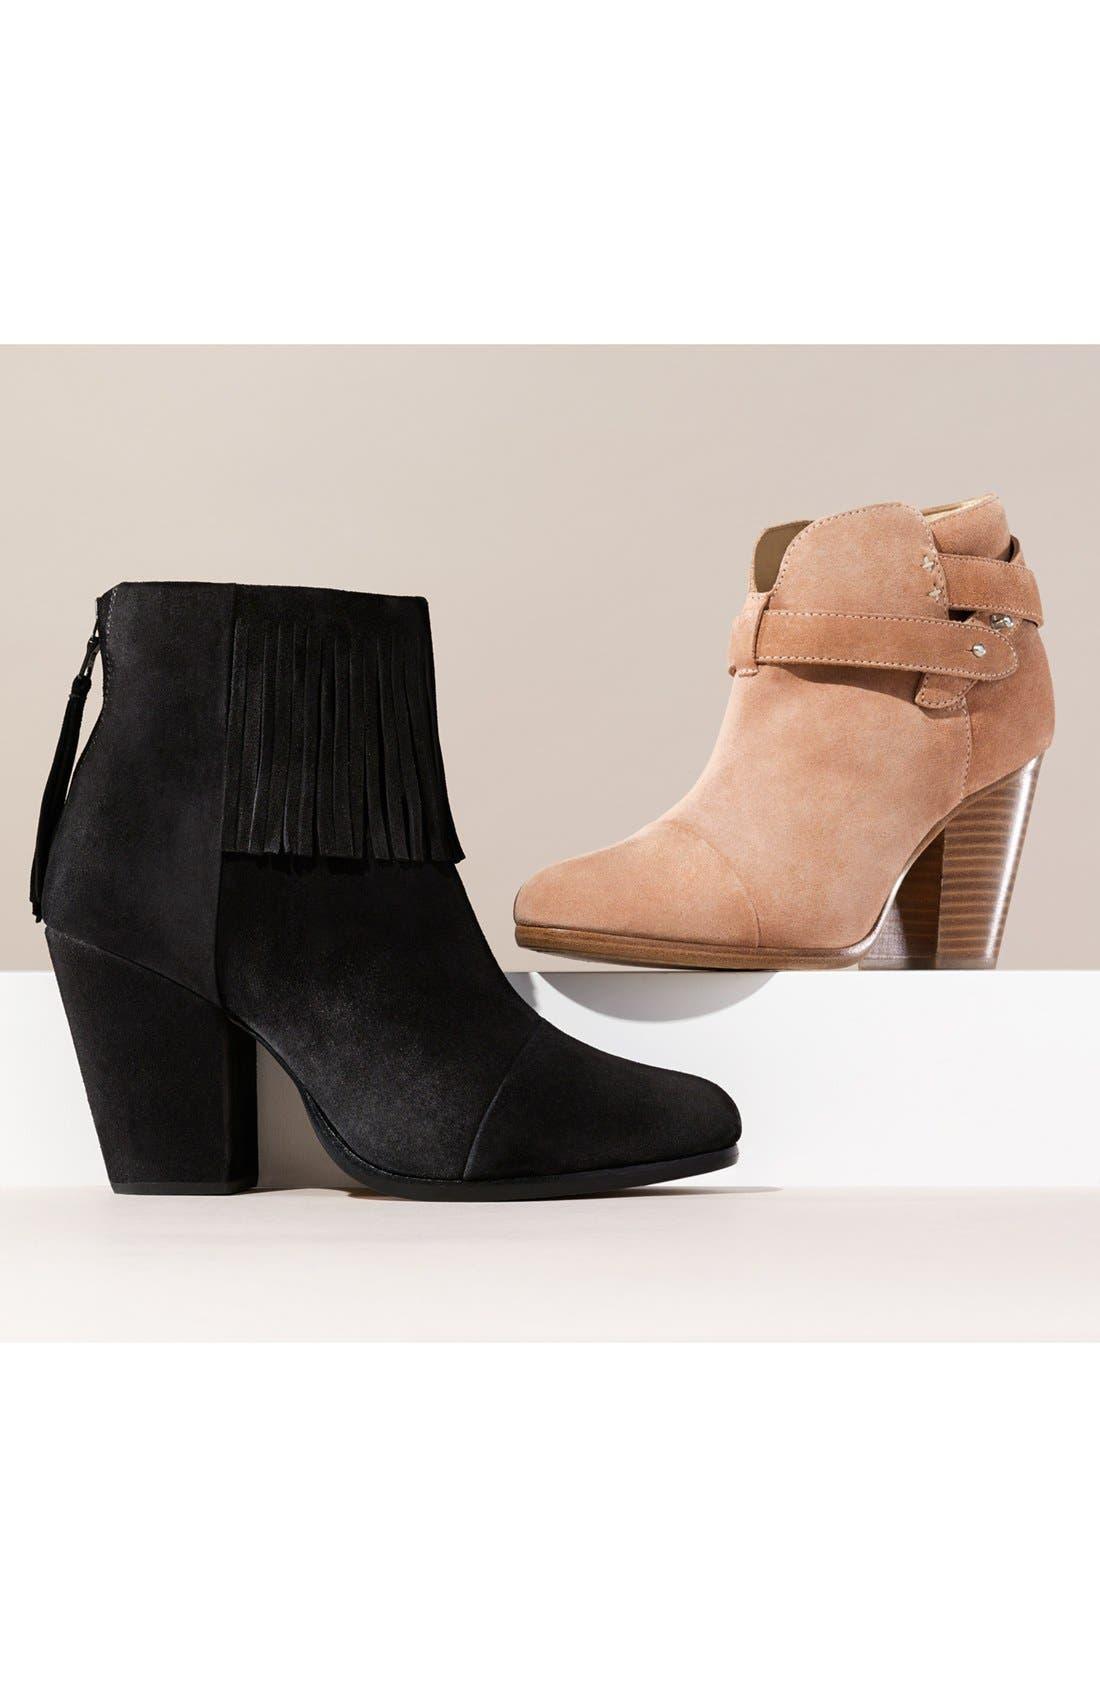 'Harrow' Leather Boot,                             Alternate thumbnail 9, color,                             BLACK